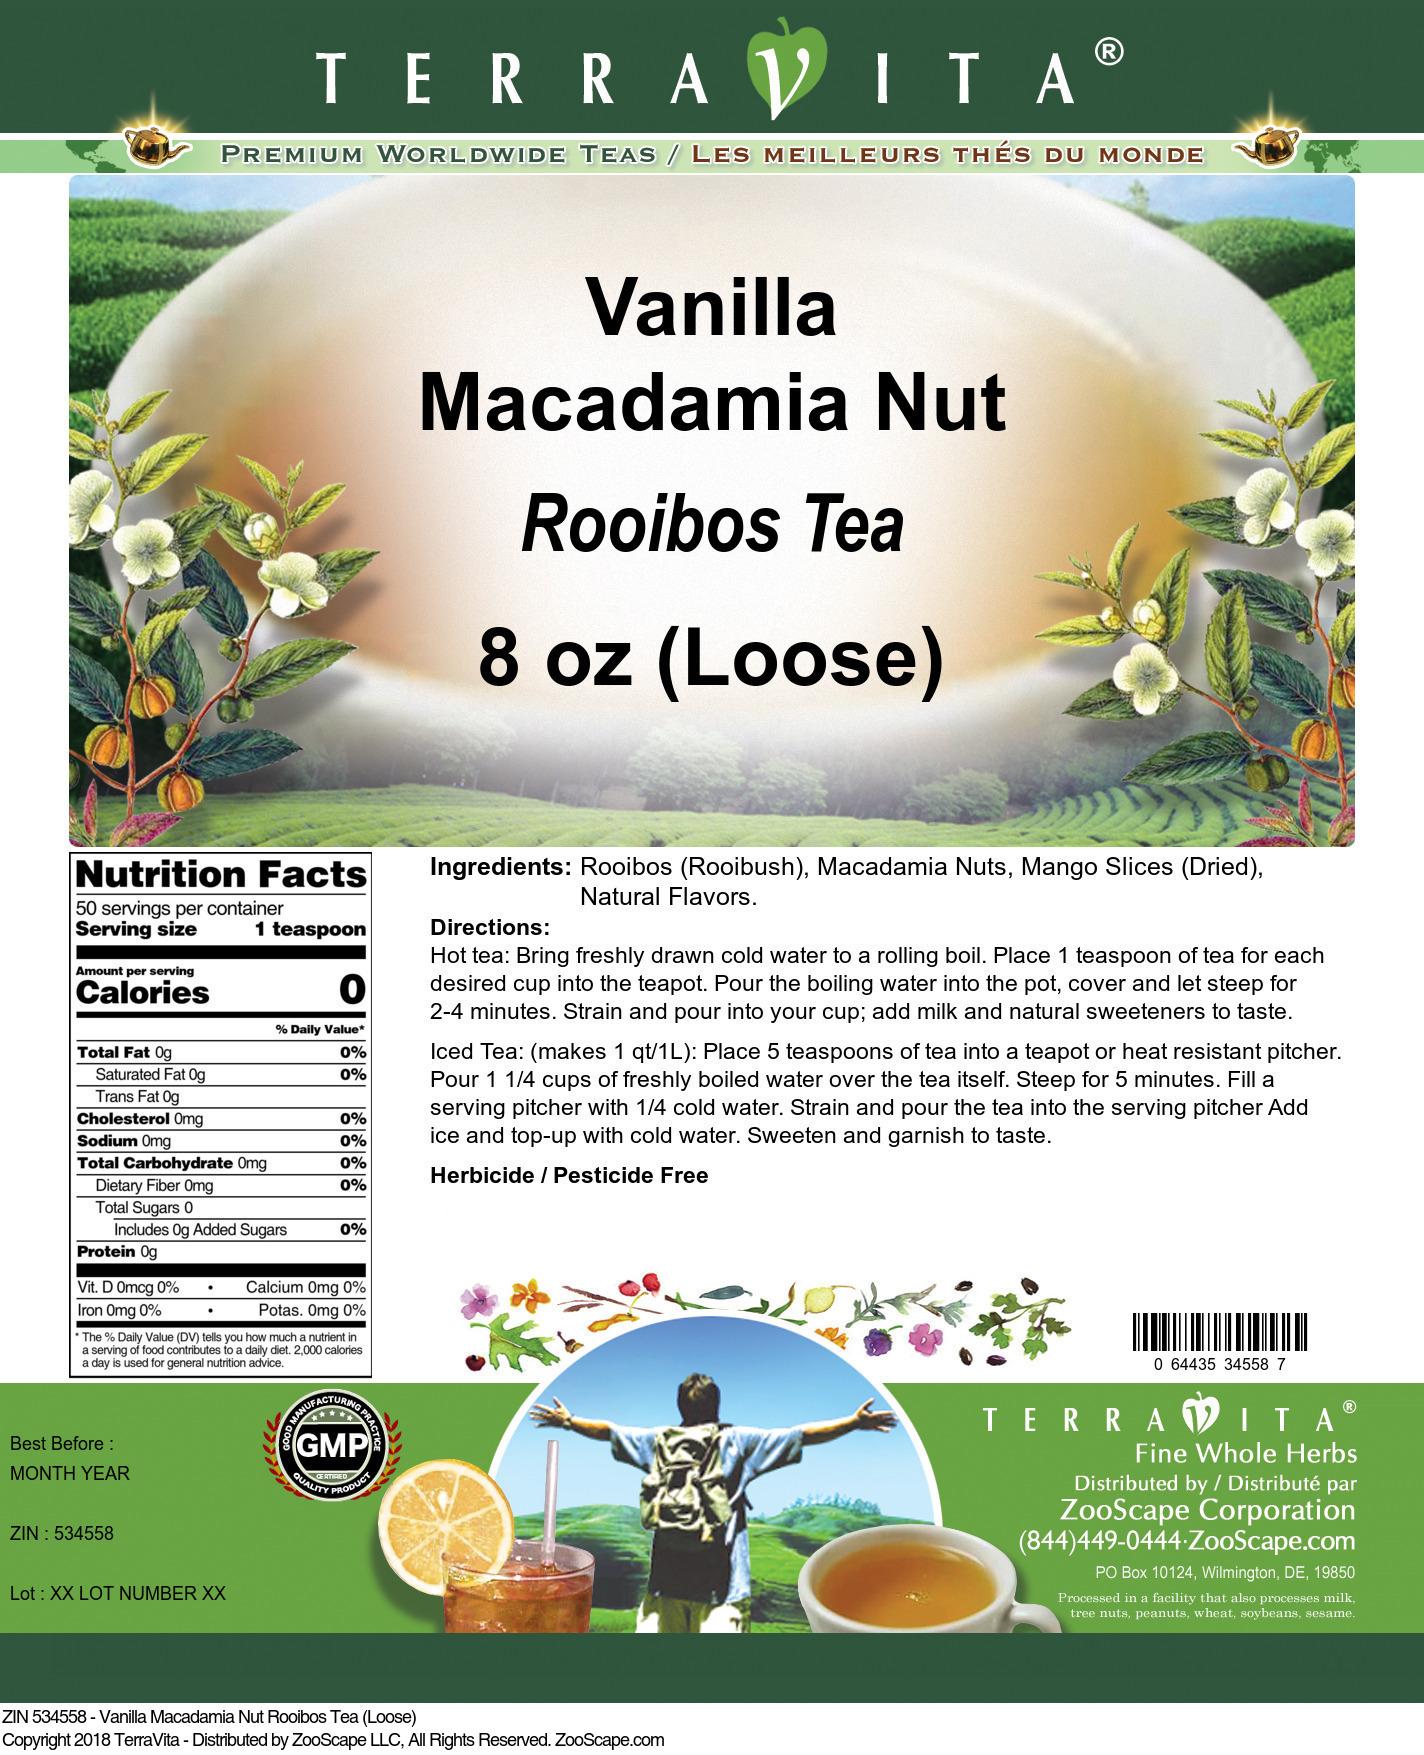 Vanilla Macadamia Nut Rooibos Tea (Loose)